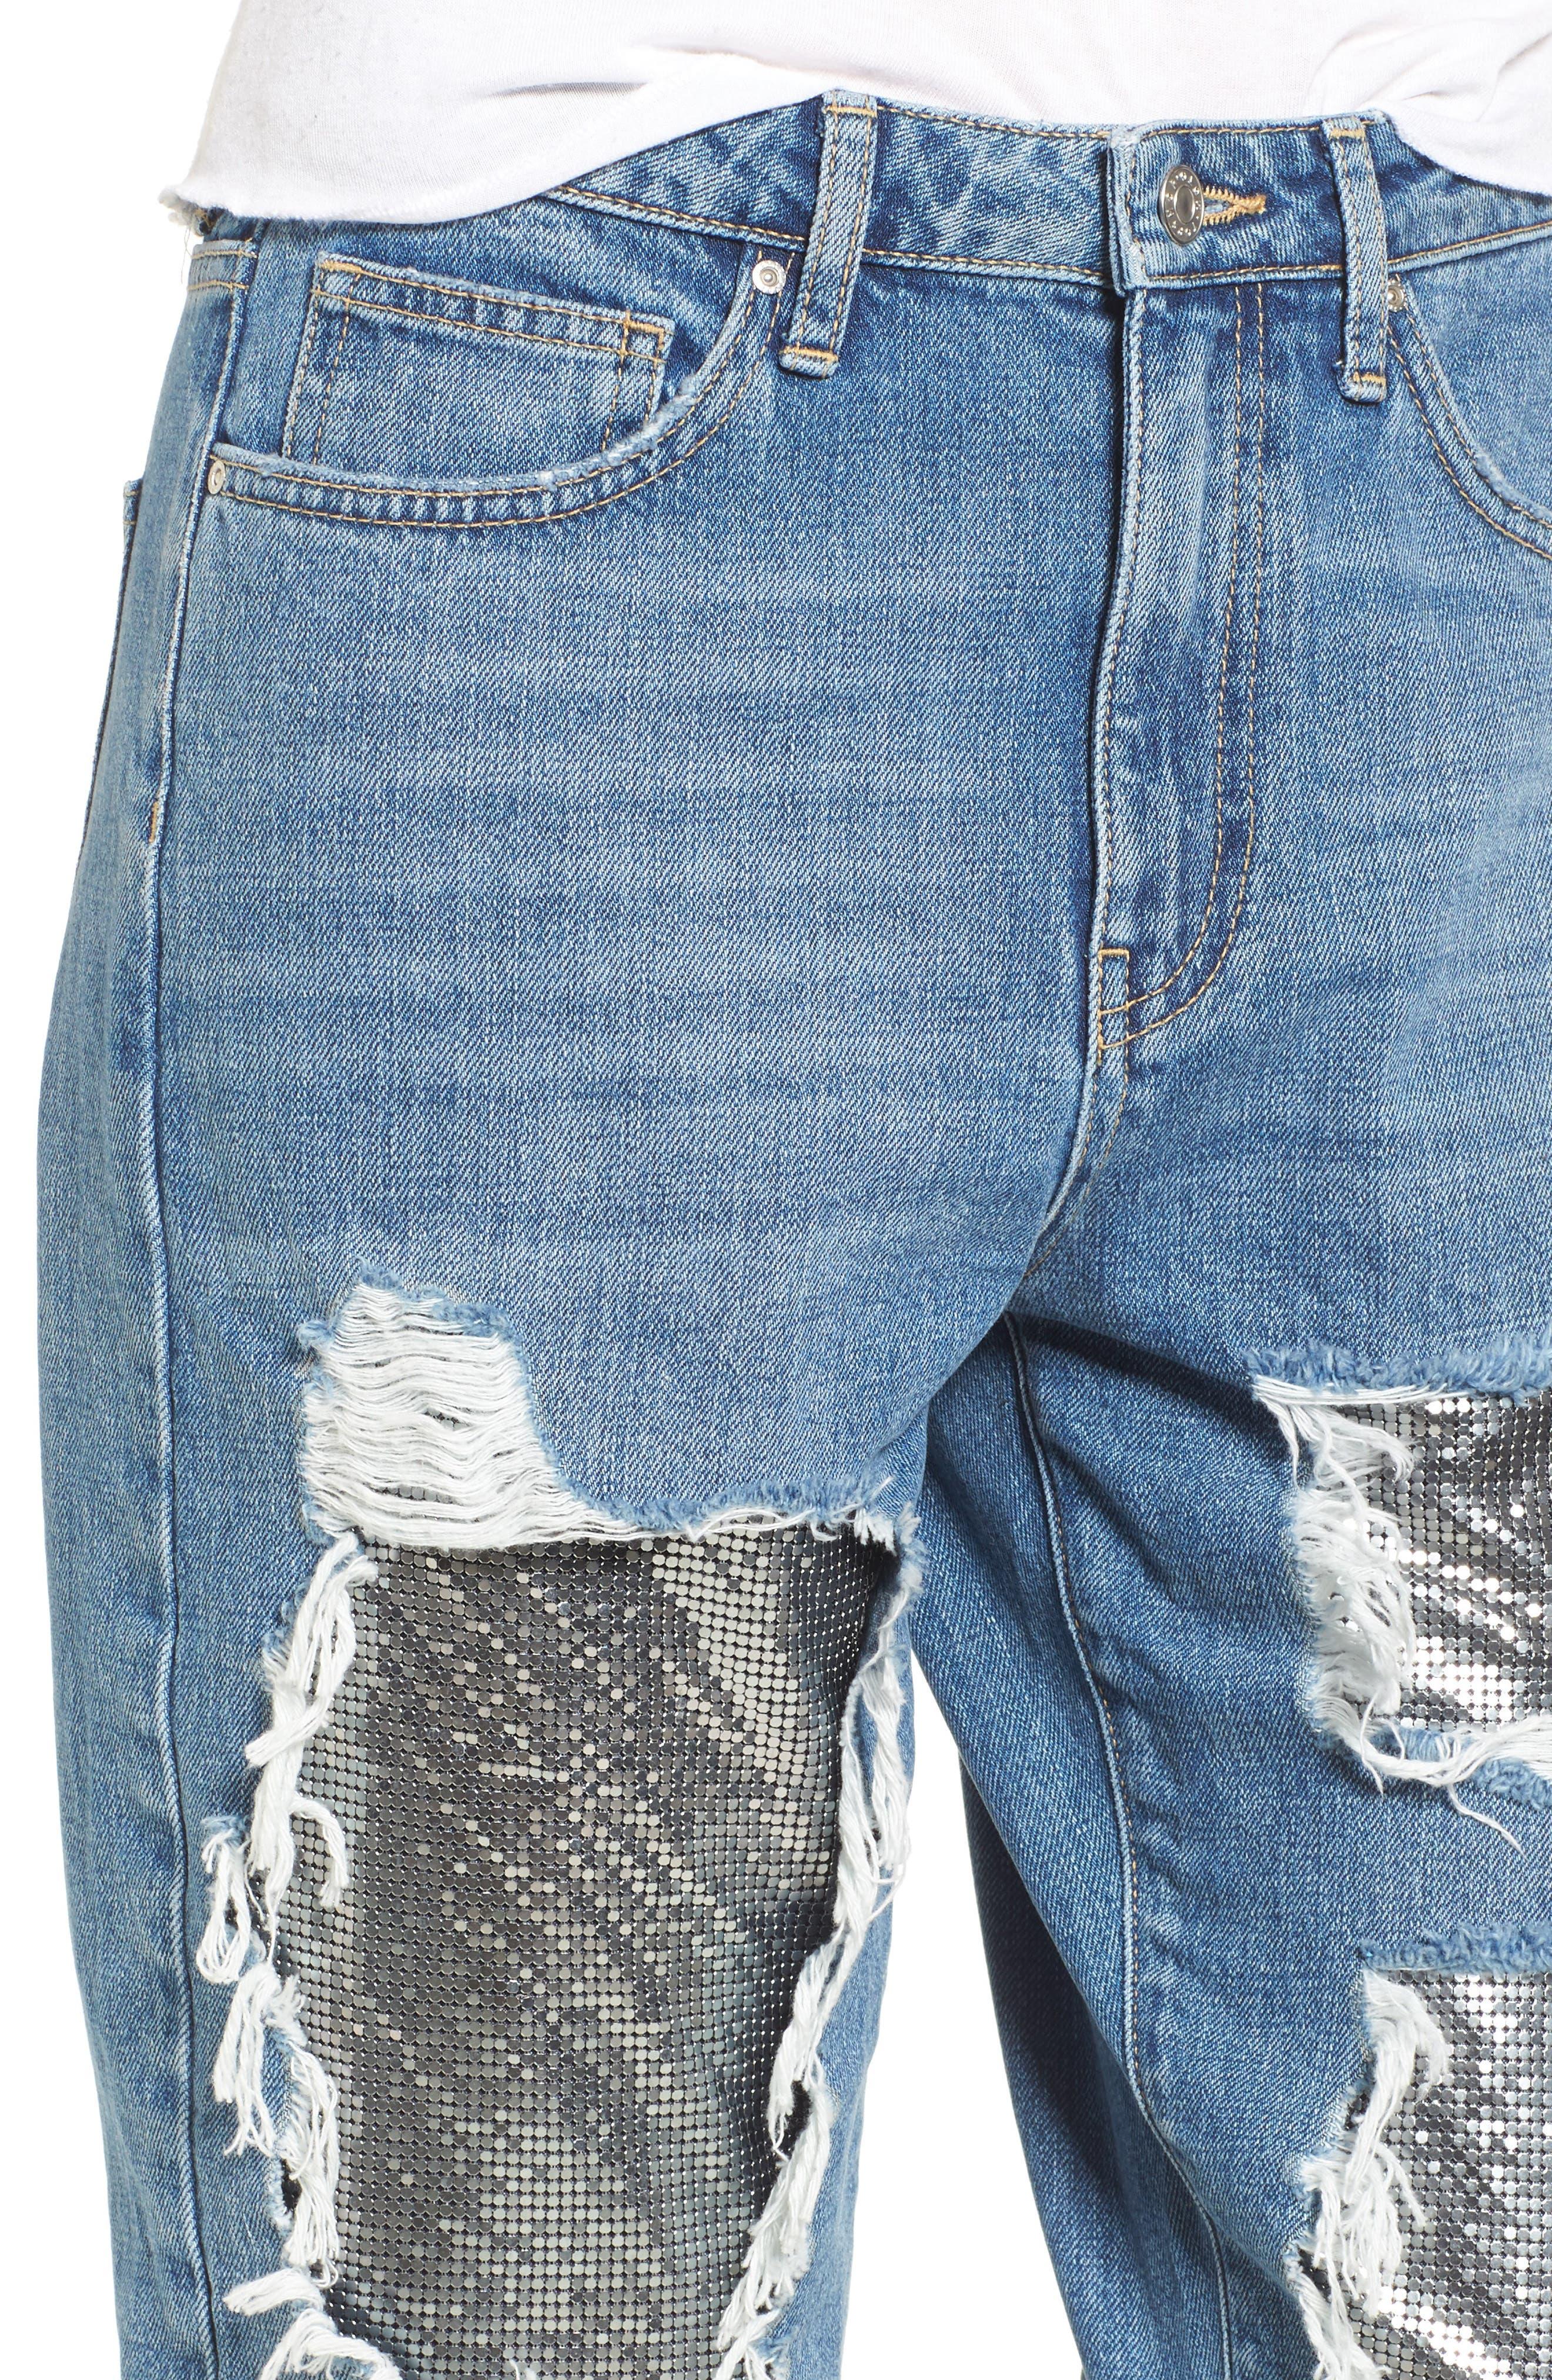 Chain Mail Boyfriend Jeans,                             Alternate thumbnail 6, color,                             Light Denim Multi